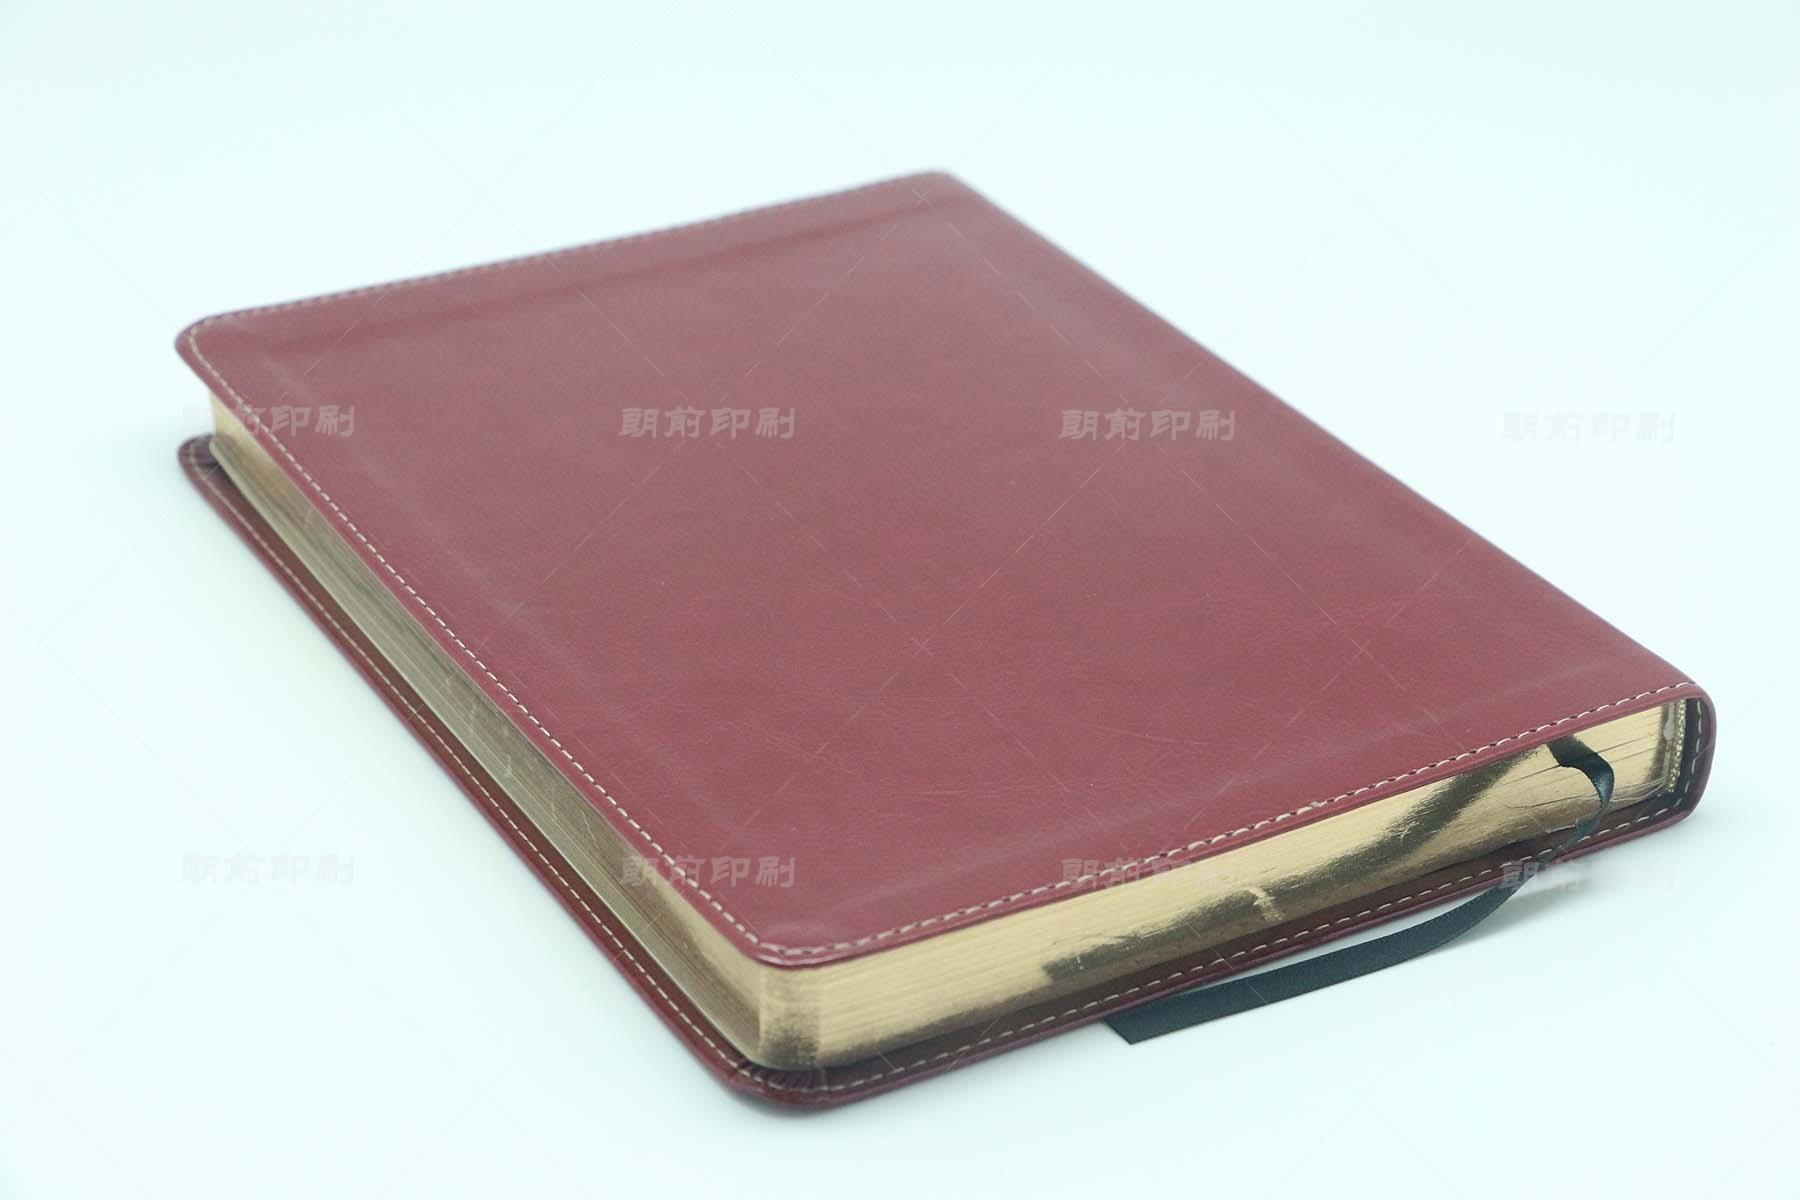 PD PU料软皮精装笔记本印刷